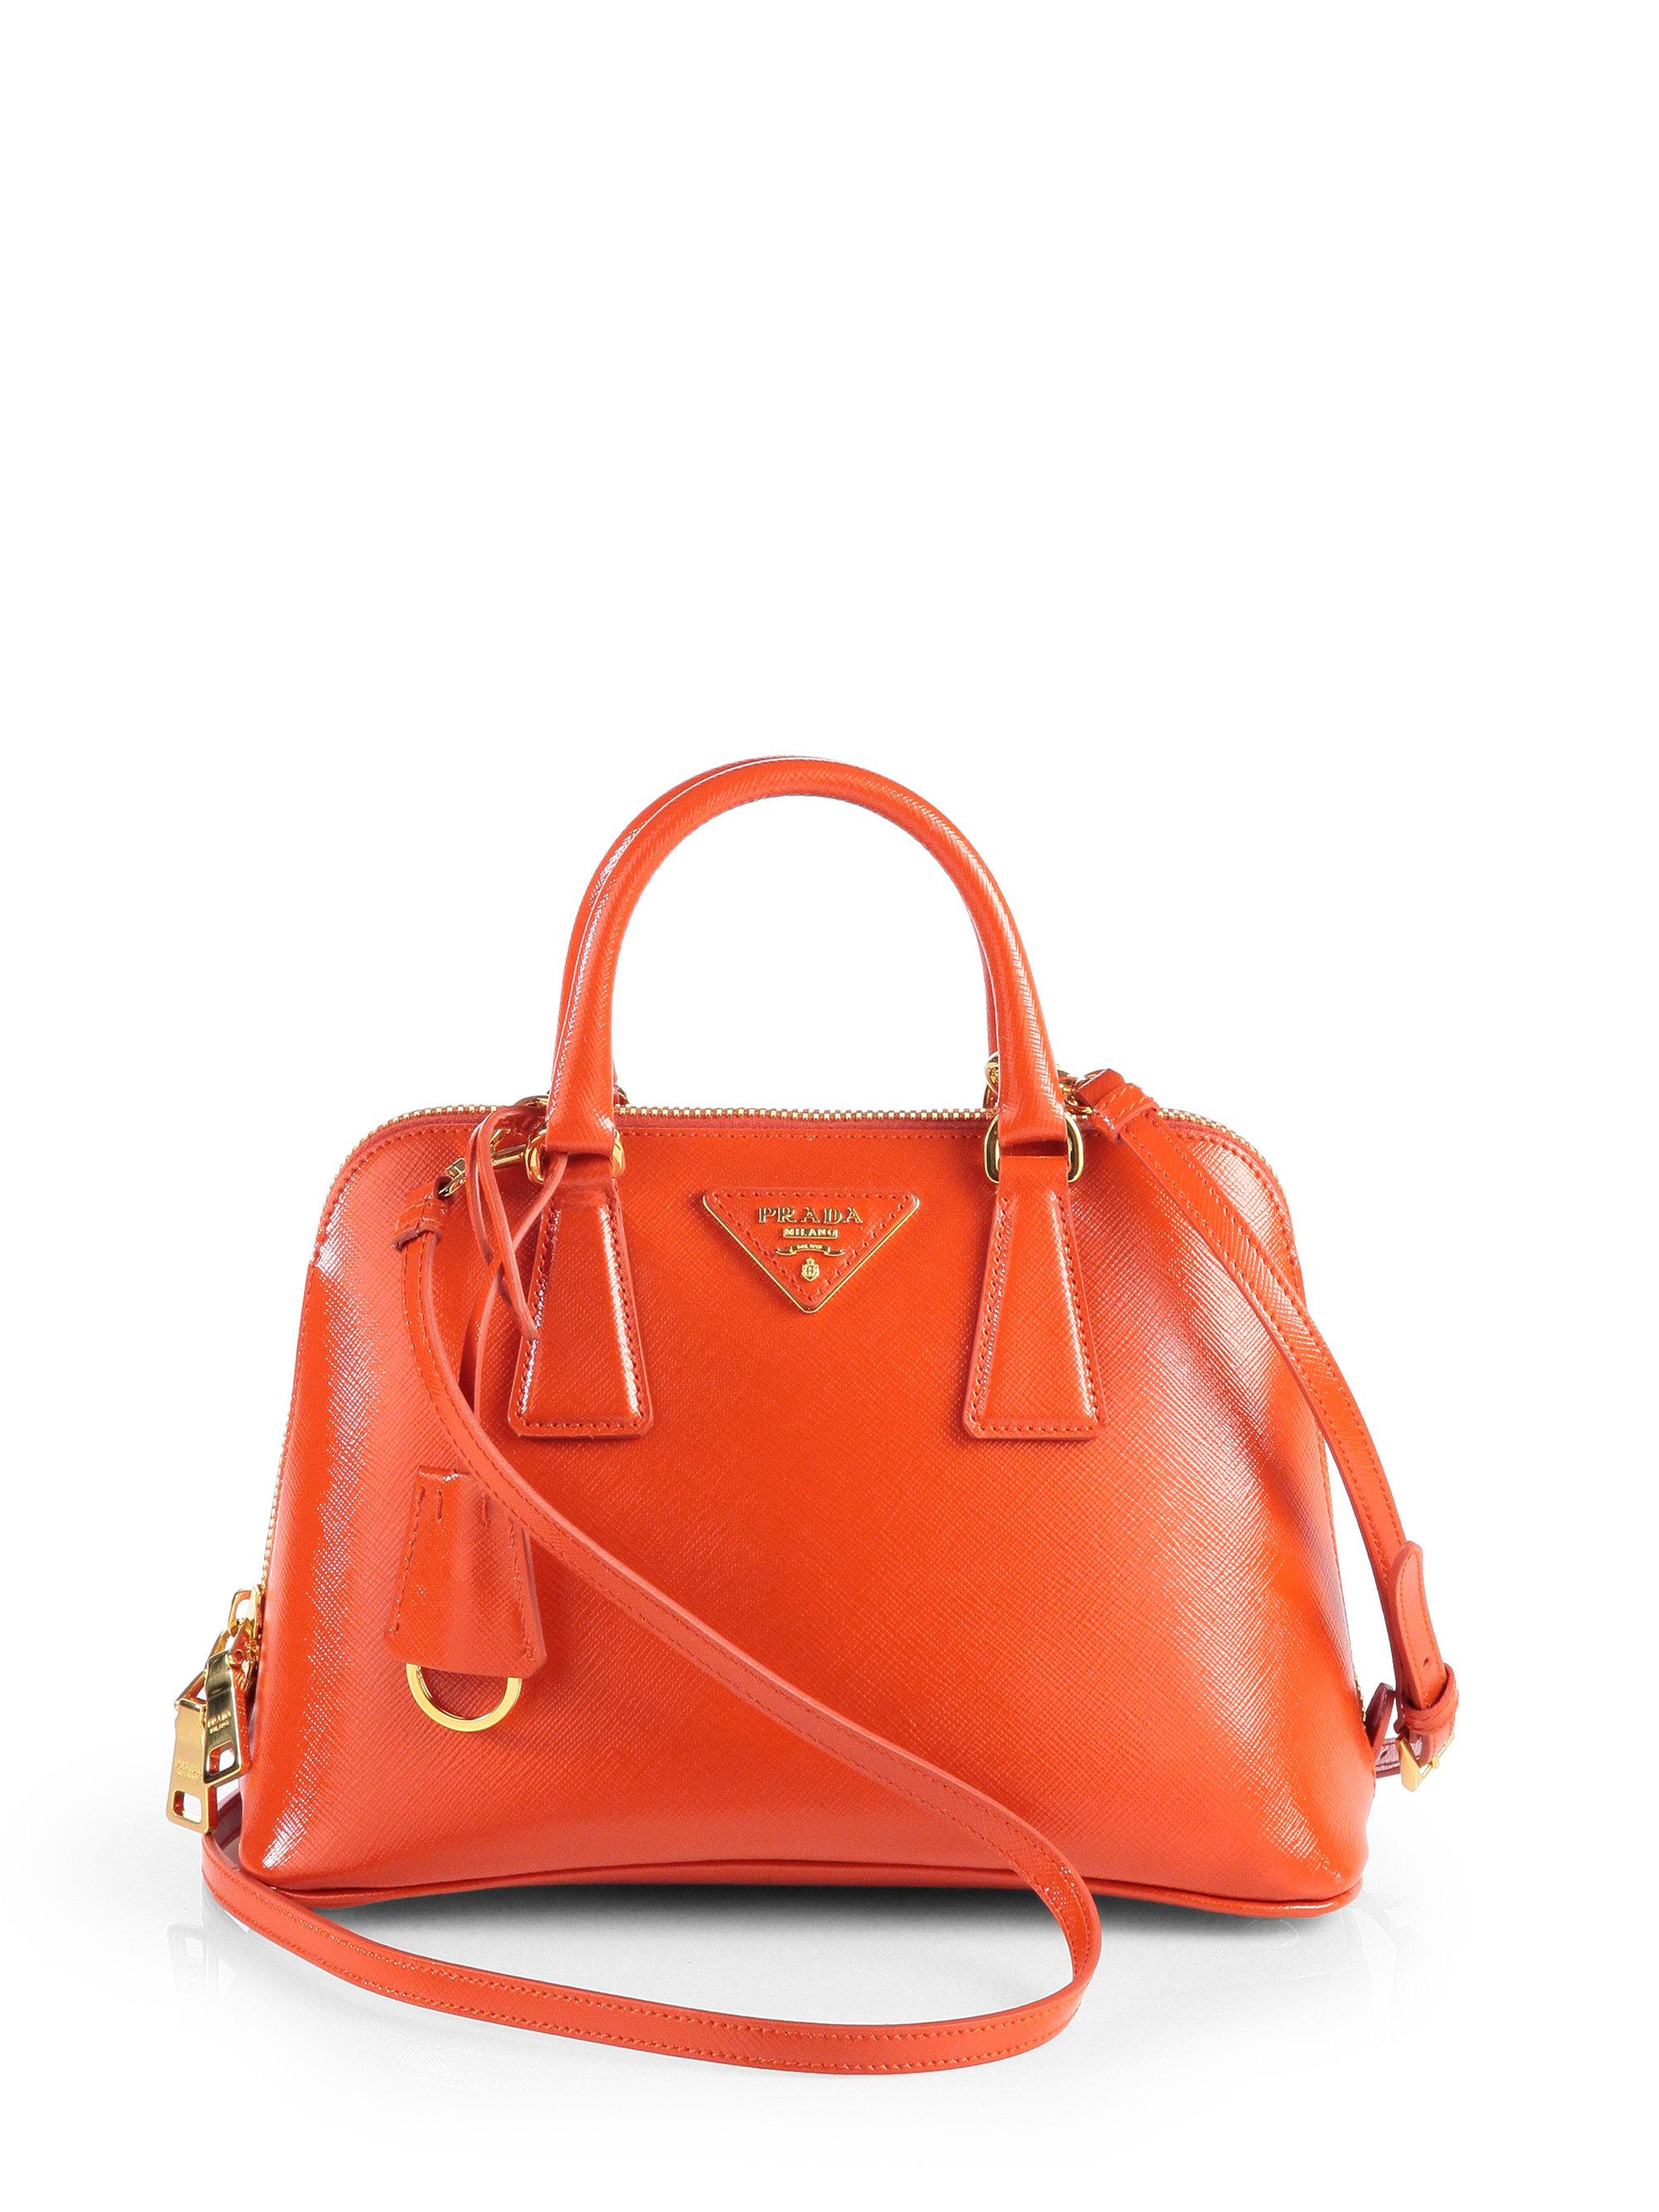 pink and grey pradas - prada vernice handle bag, prada authentic bags